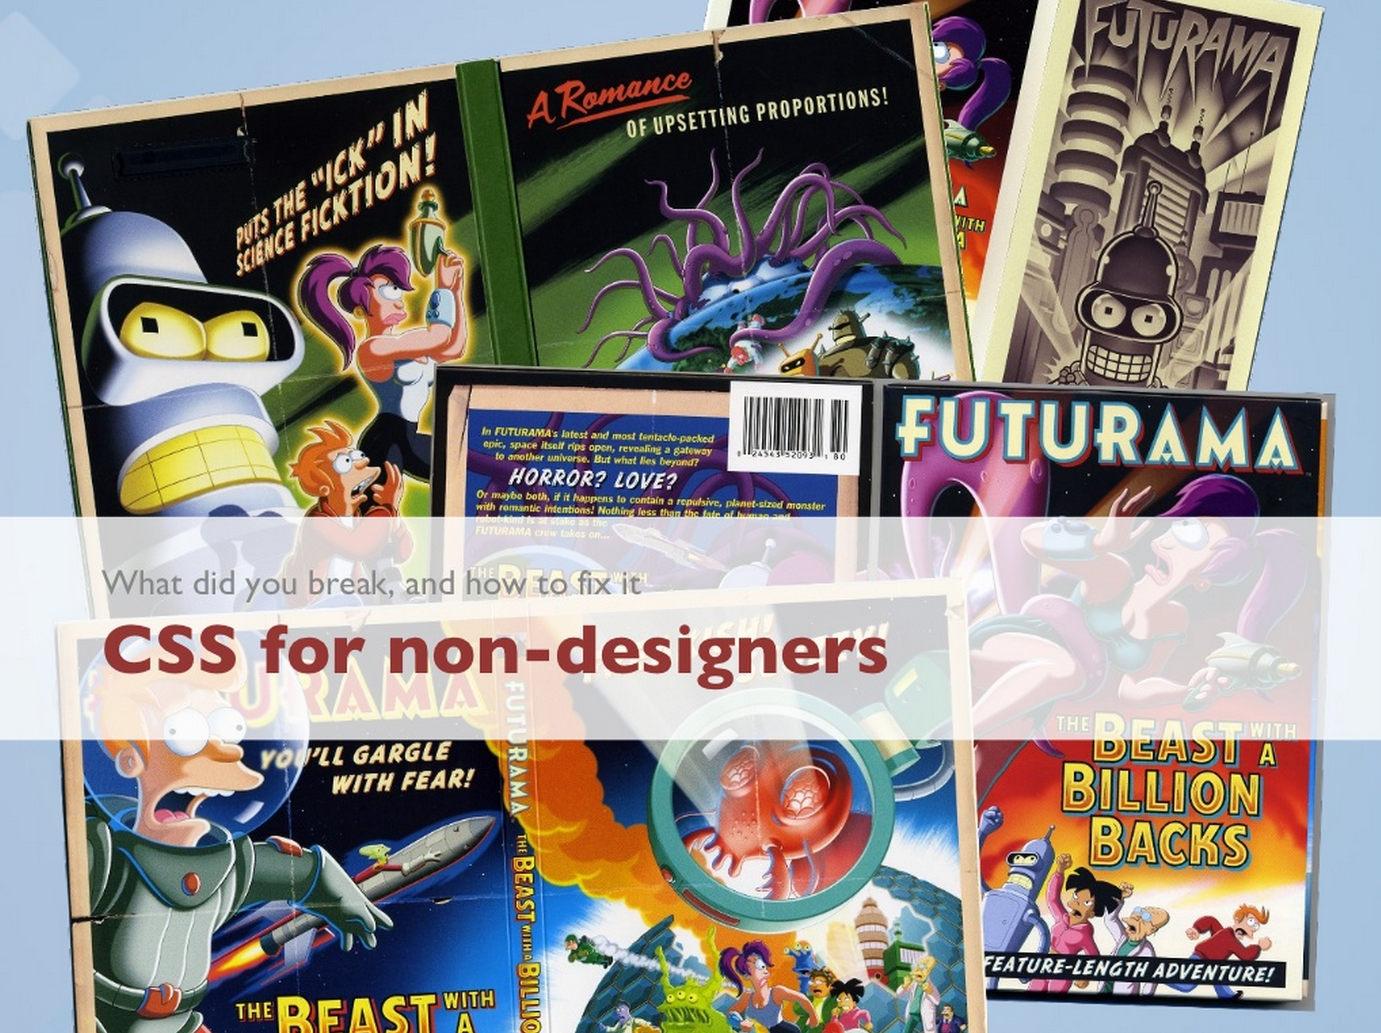 CSS for non-designers